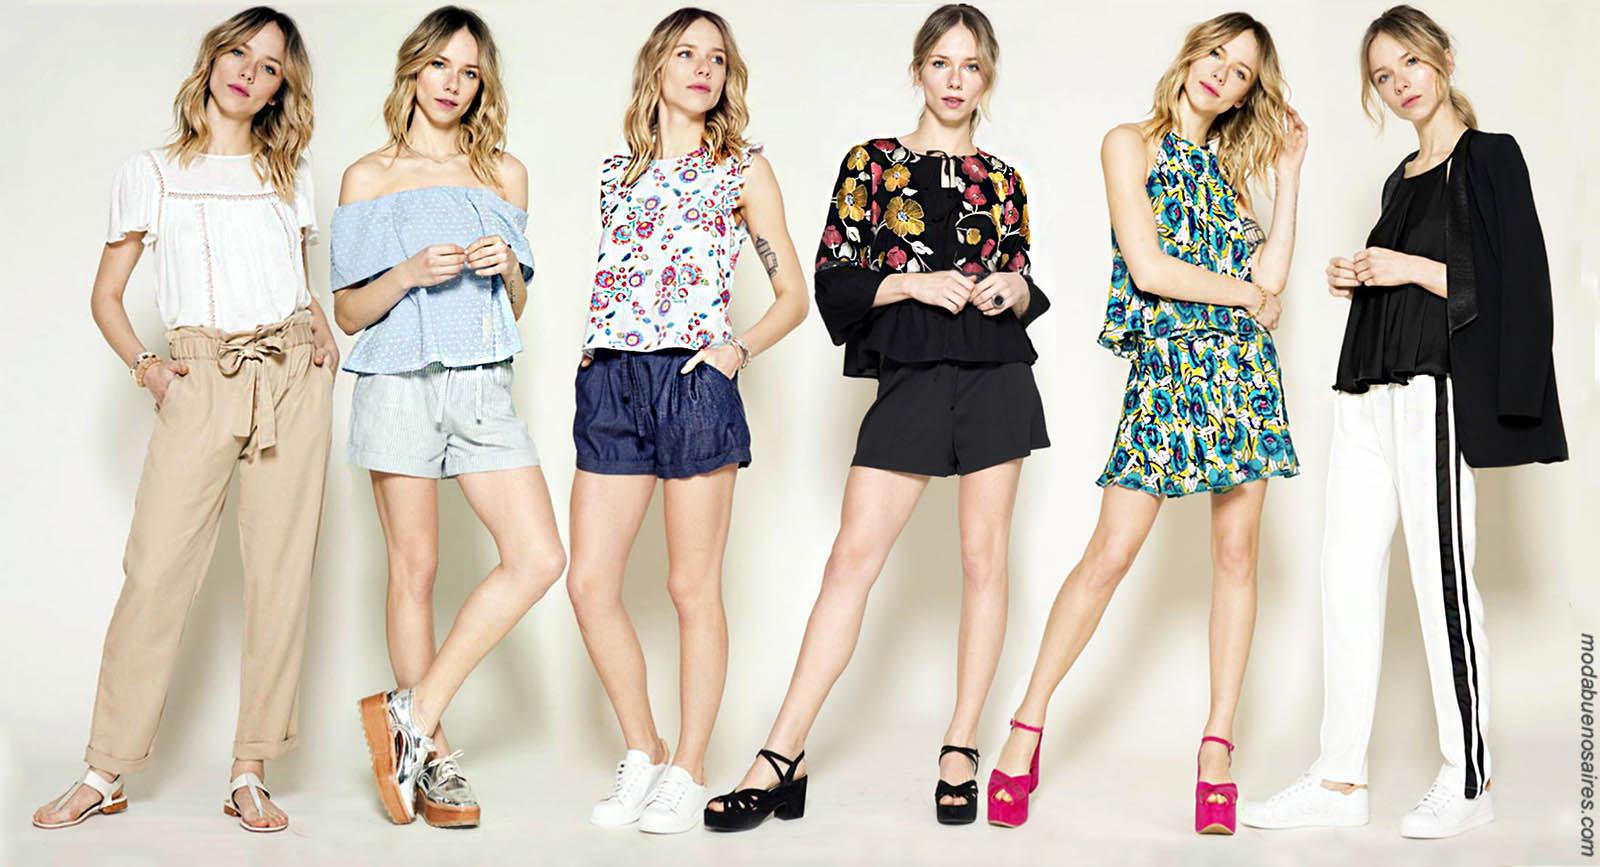 Moda 2019 moda y tendencias en buenos aires moda - Colores de moda ...